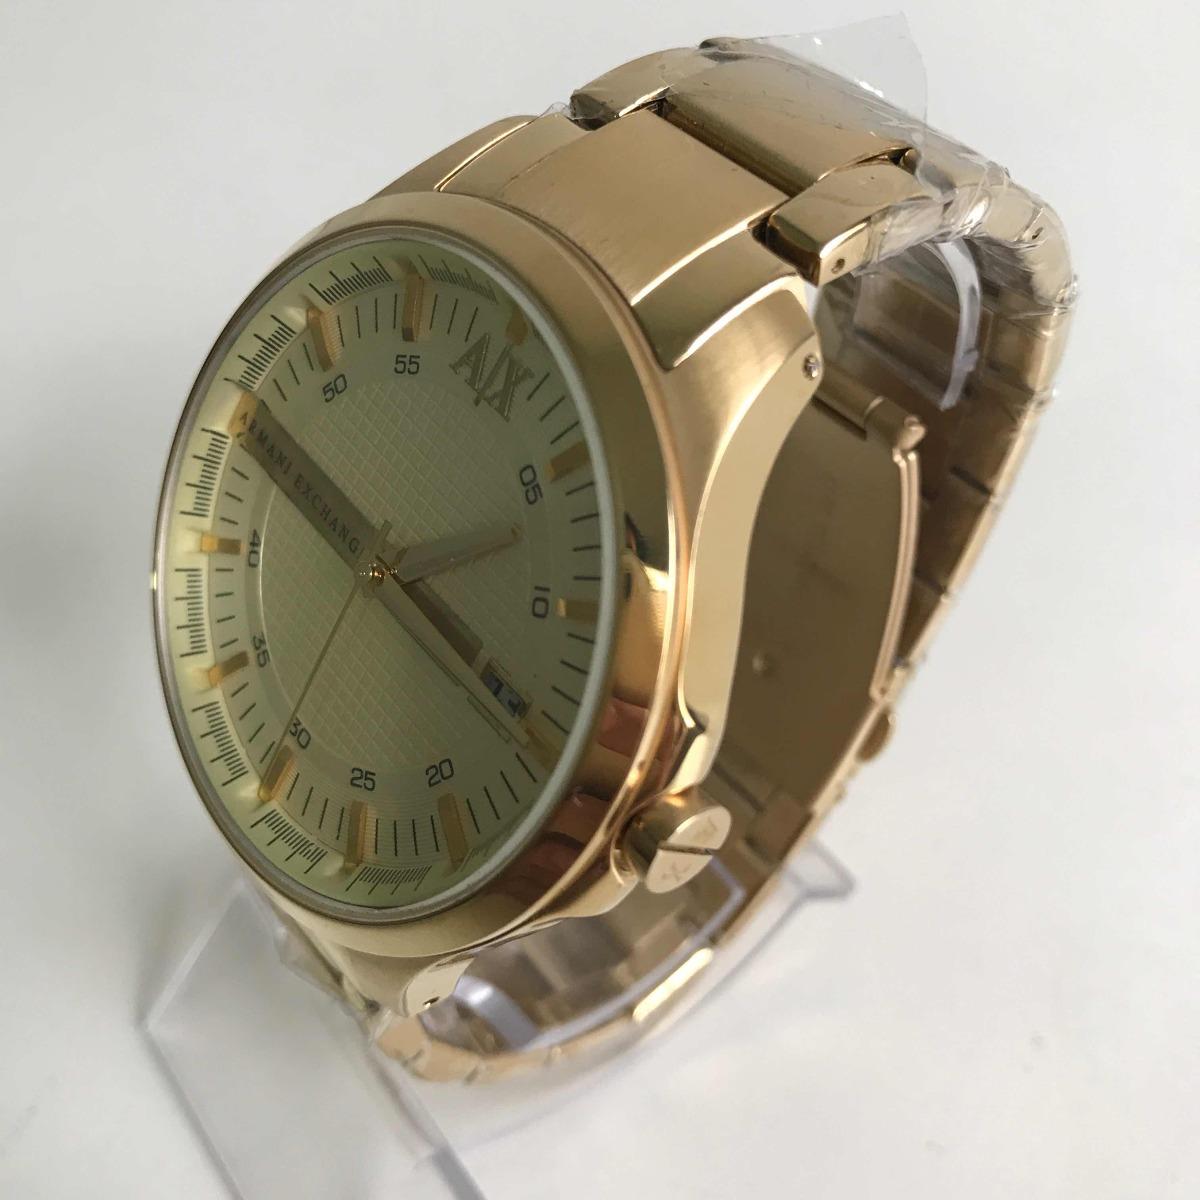 f432c1896b1 Relógio Armani Exchange Ax-2131 Dourado. - R  599